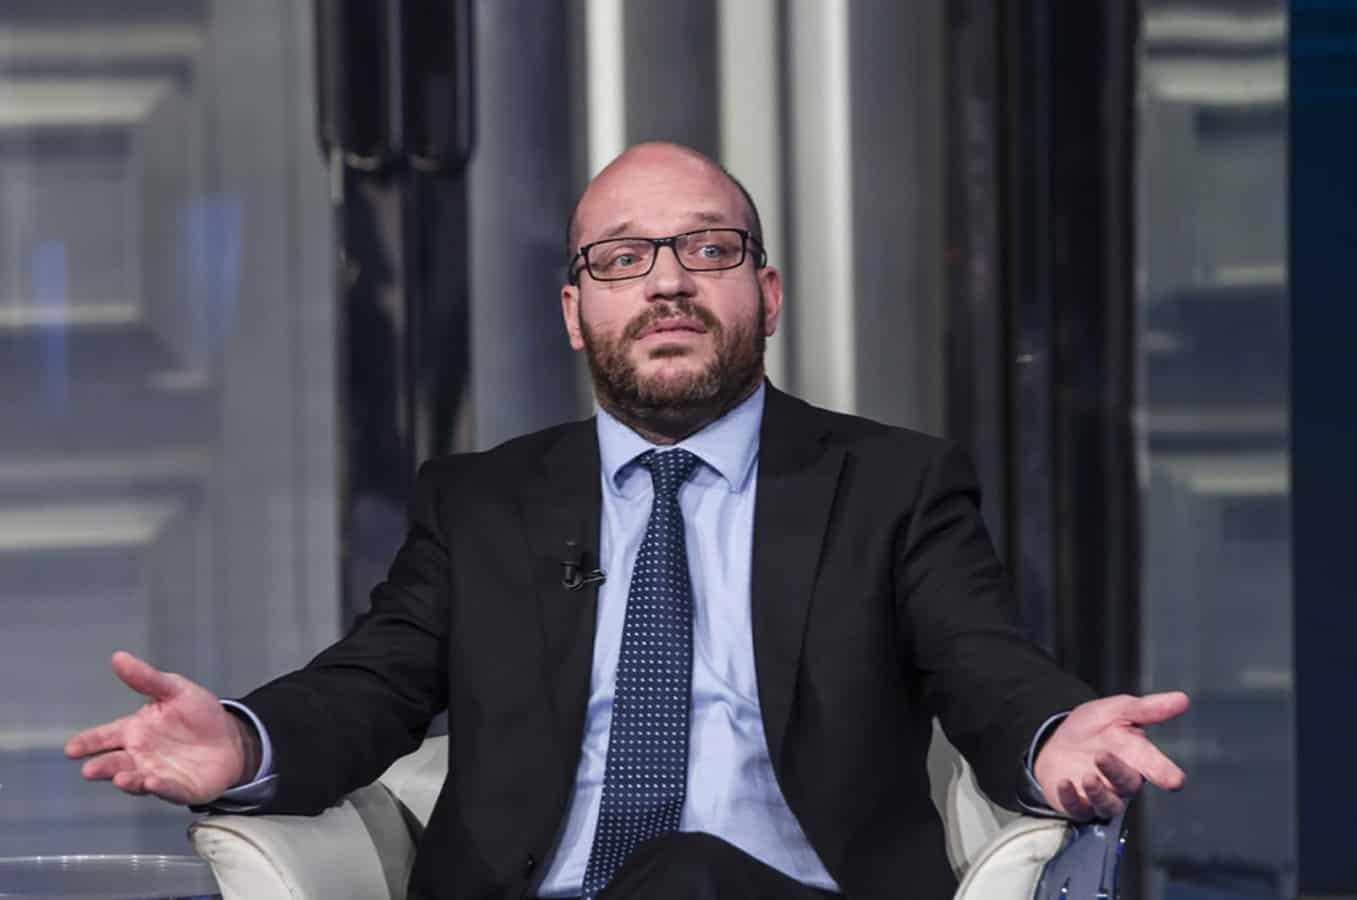 Legge Mancino: il ministro Fontana vuole abolirla